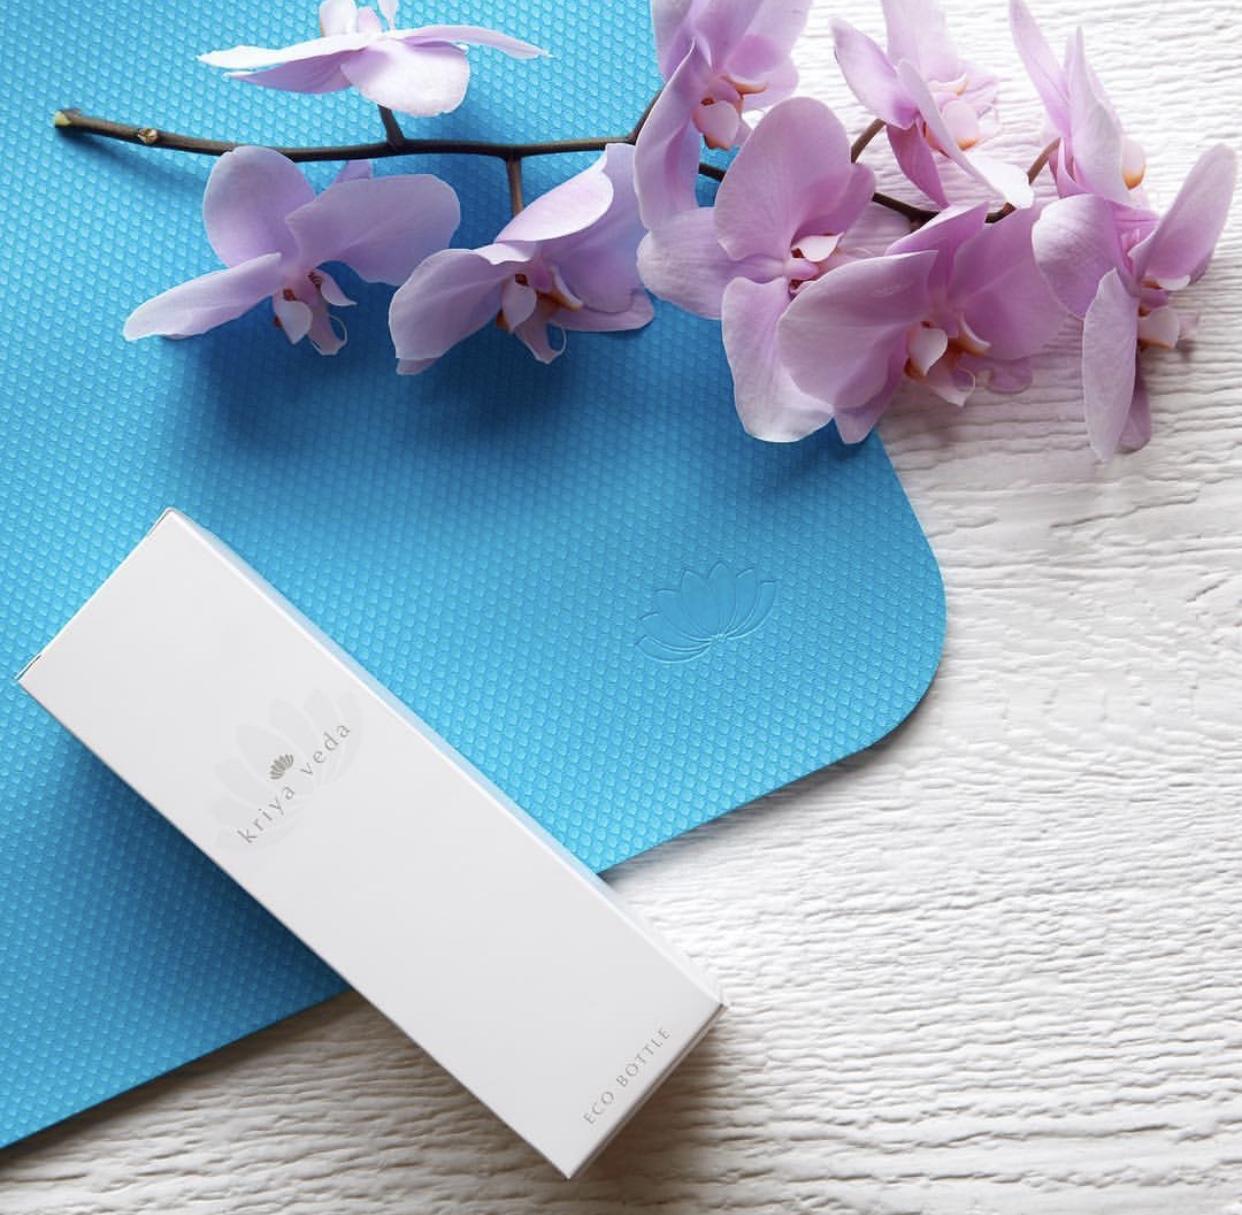 KRIYA VEDA, NATURAL HEALTH & WELLNESS PRODUCTS